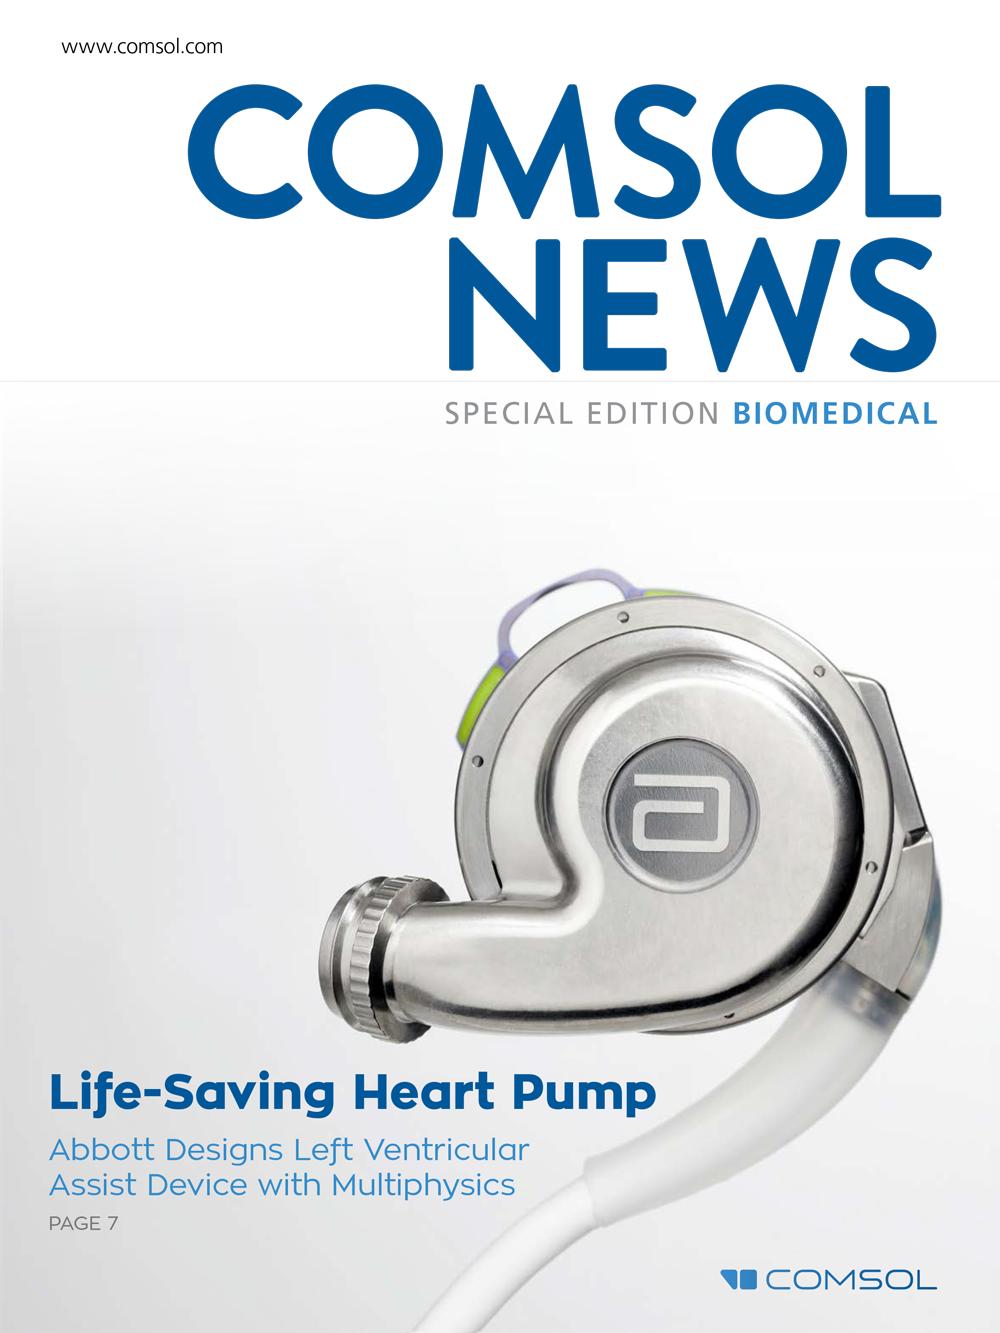 COMSOL News - Edición especial para biomedicina